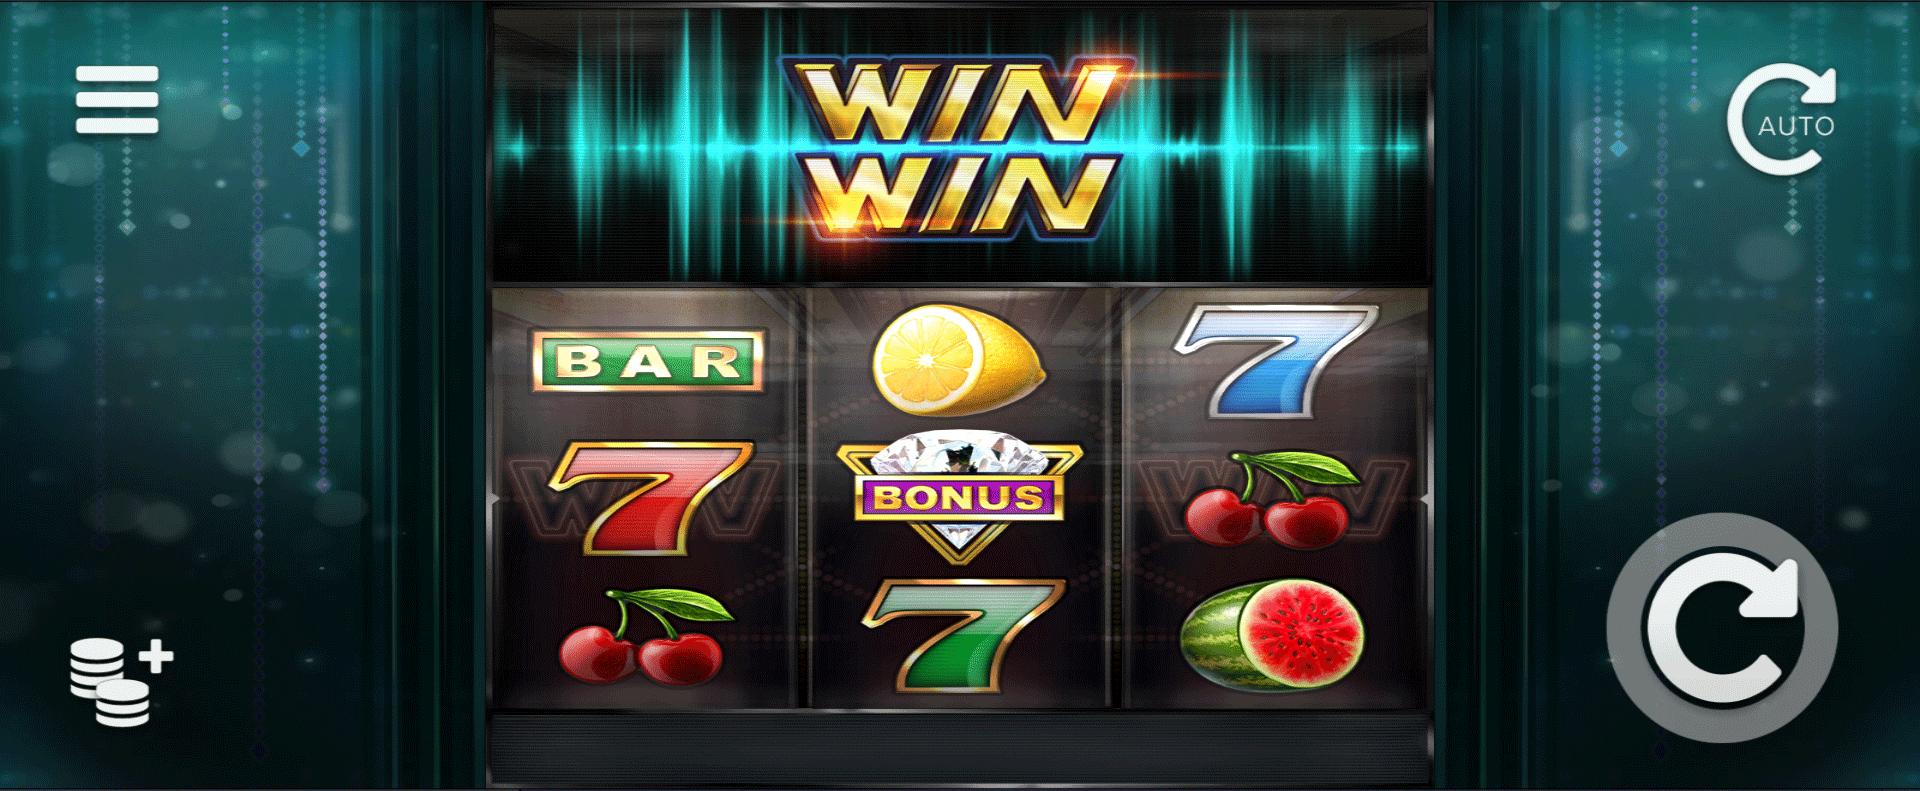 Slot Win Win